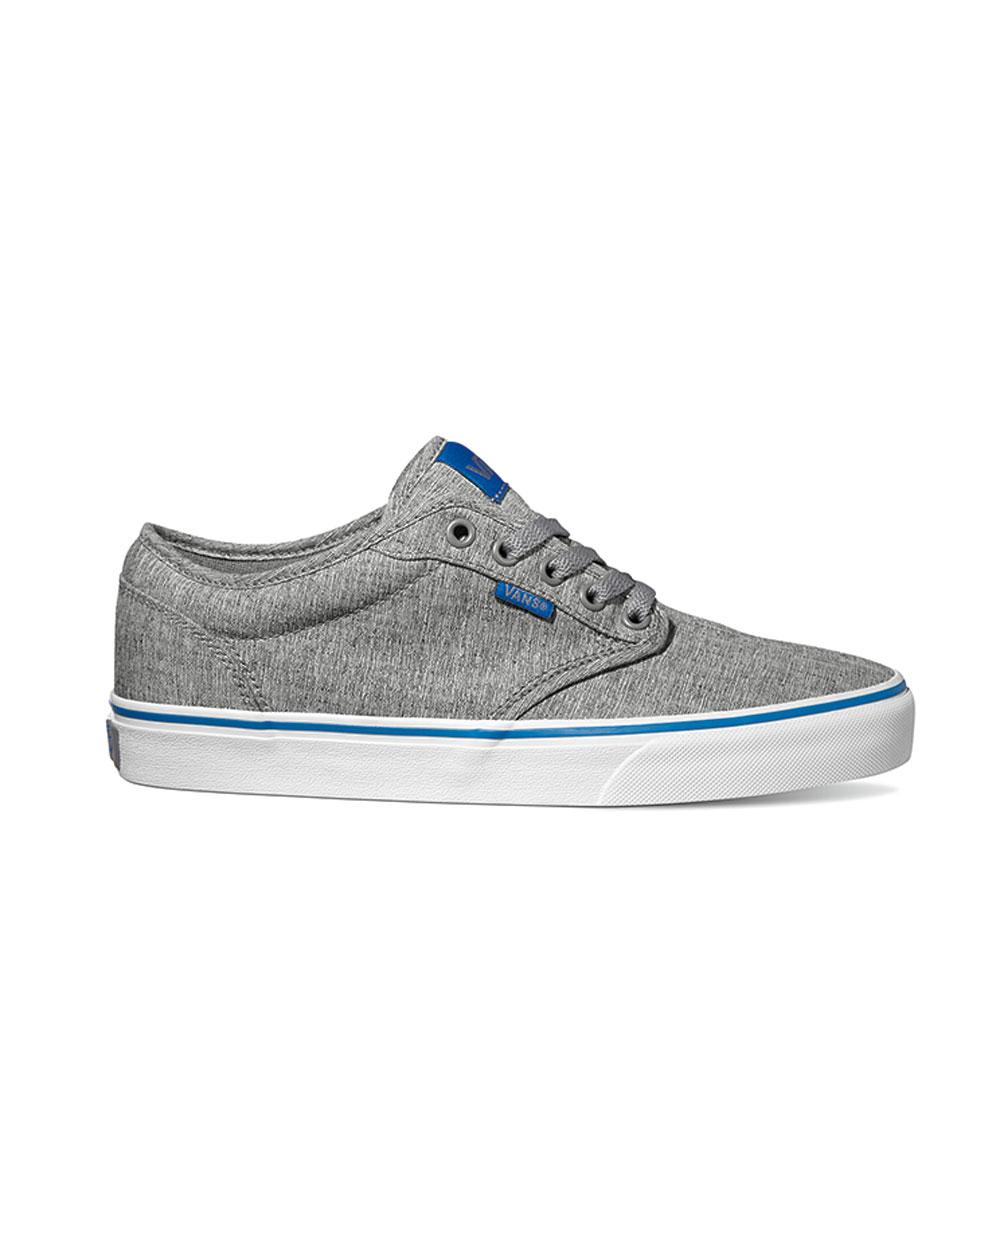 Vans Atwood Textile (grey/blue)